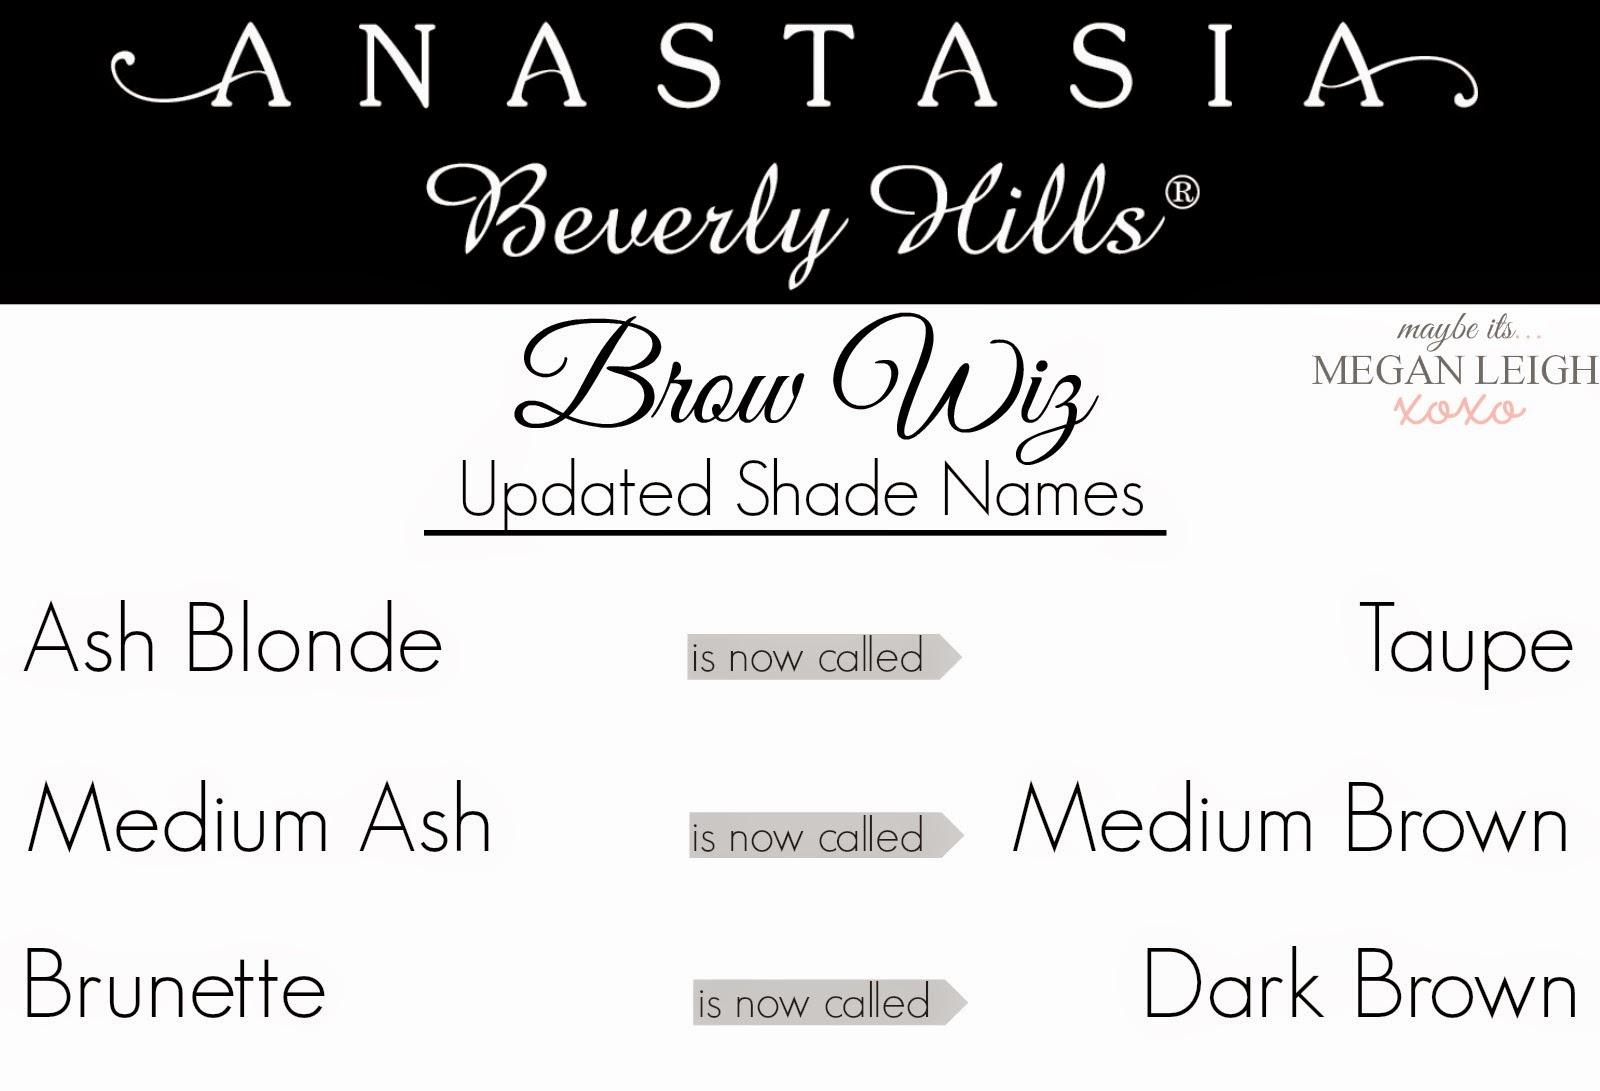 Ana Stasia & Co anastasia beverly hills - brow wiz - updated shade names